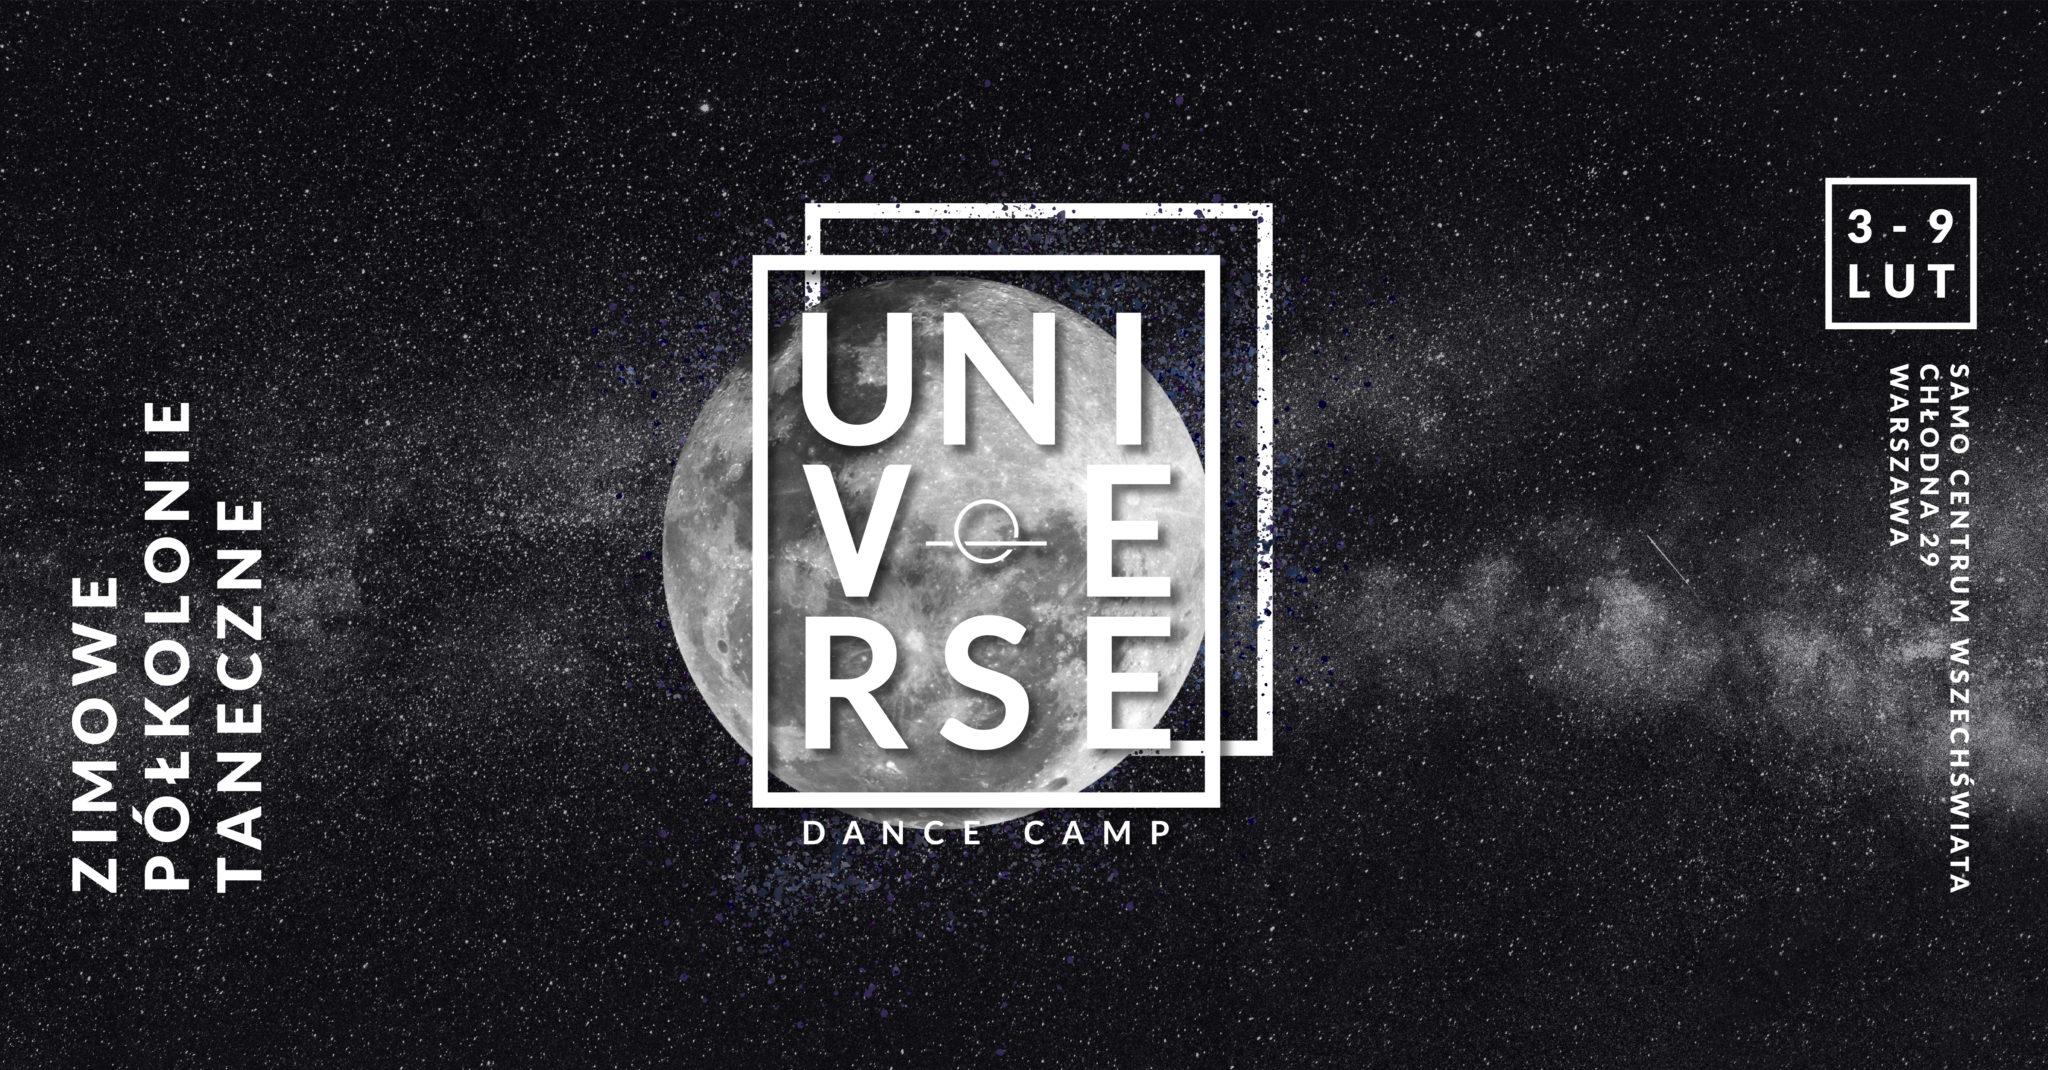 UNIVERSE DANCE CAMP